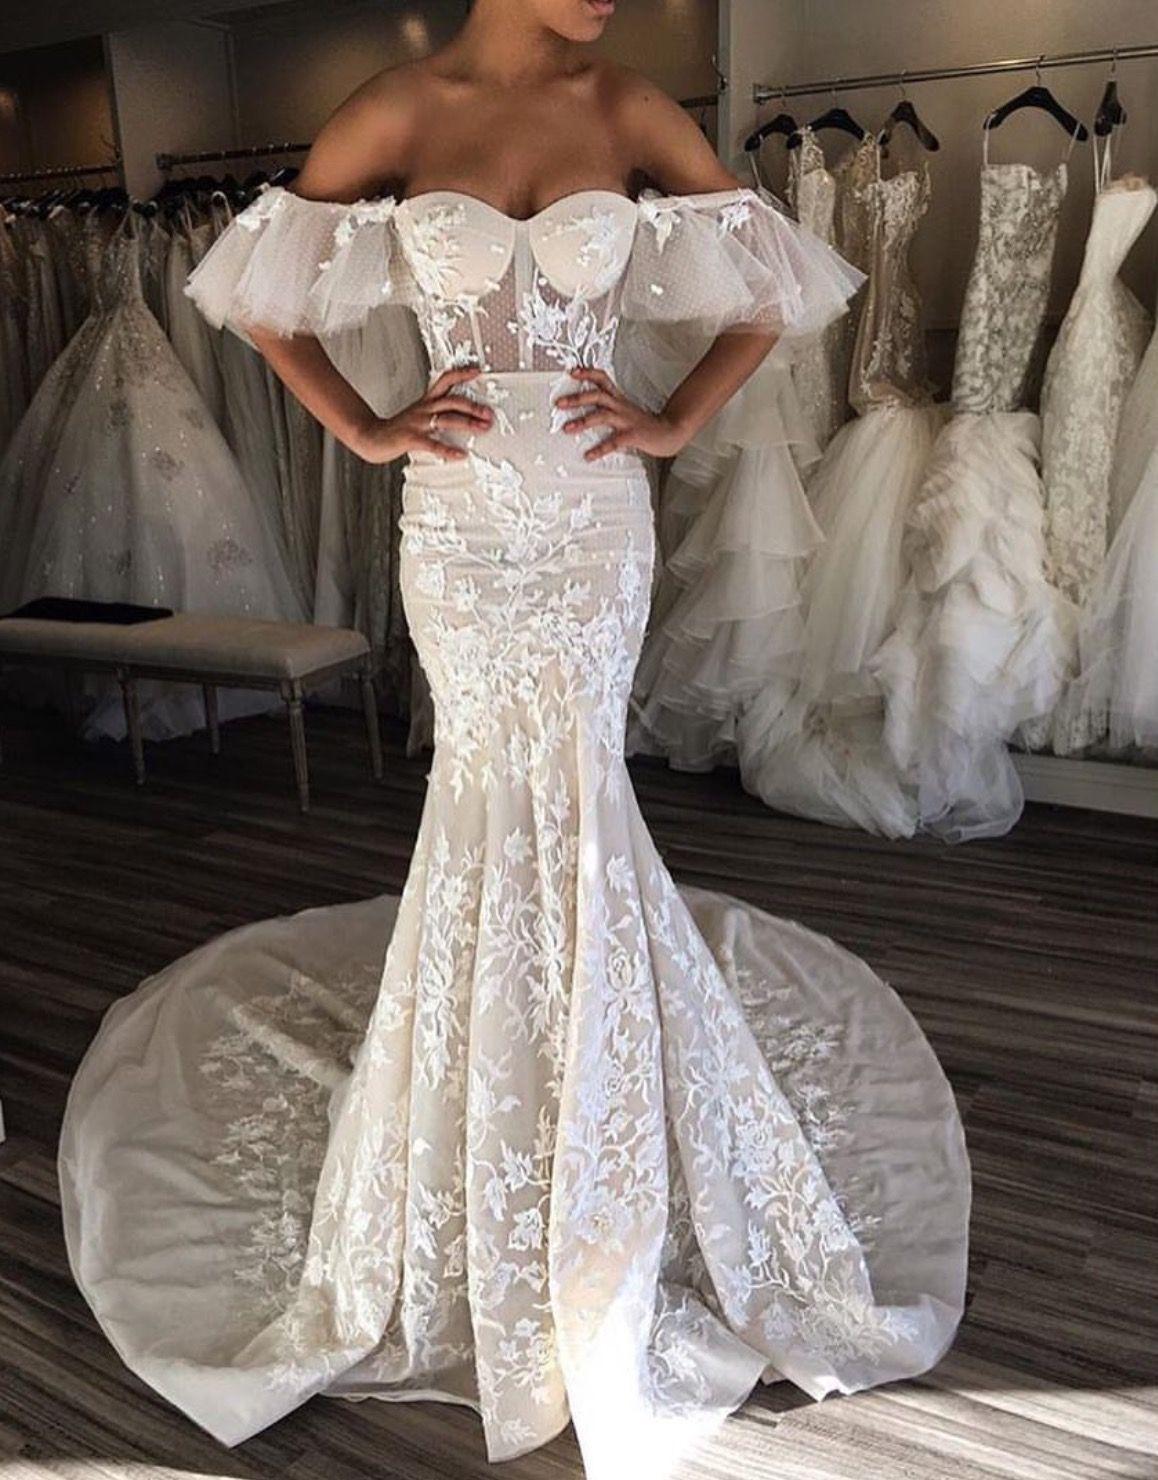 Pin by Lizelle Vermaak on Glam GlitZ! Lace wedding